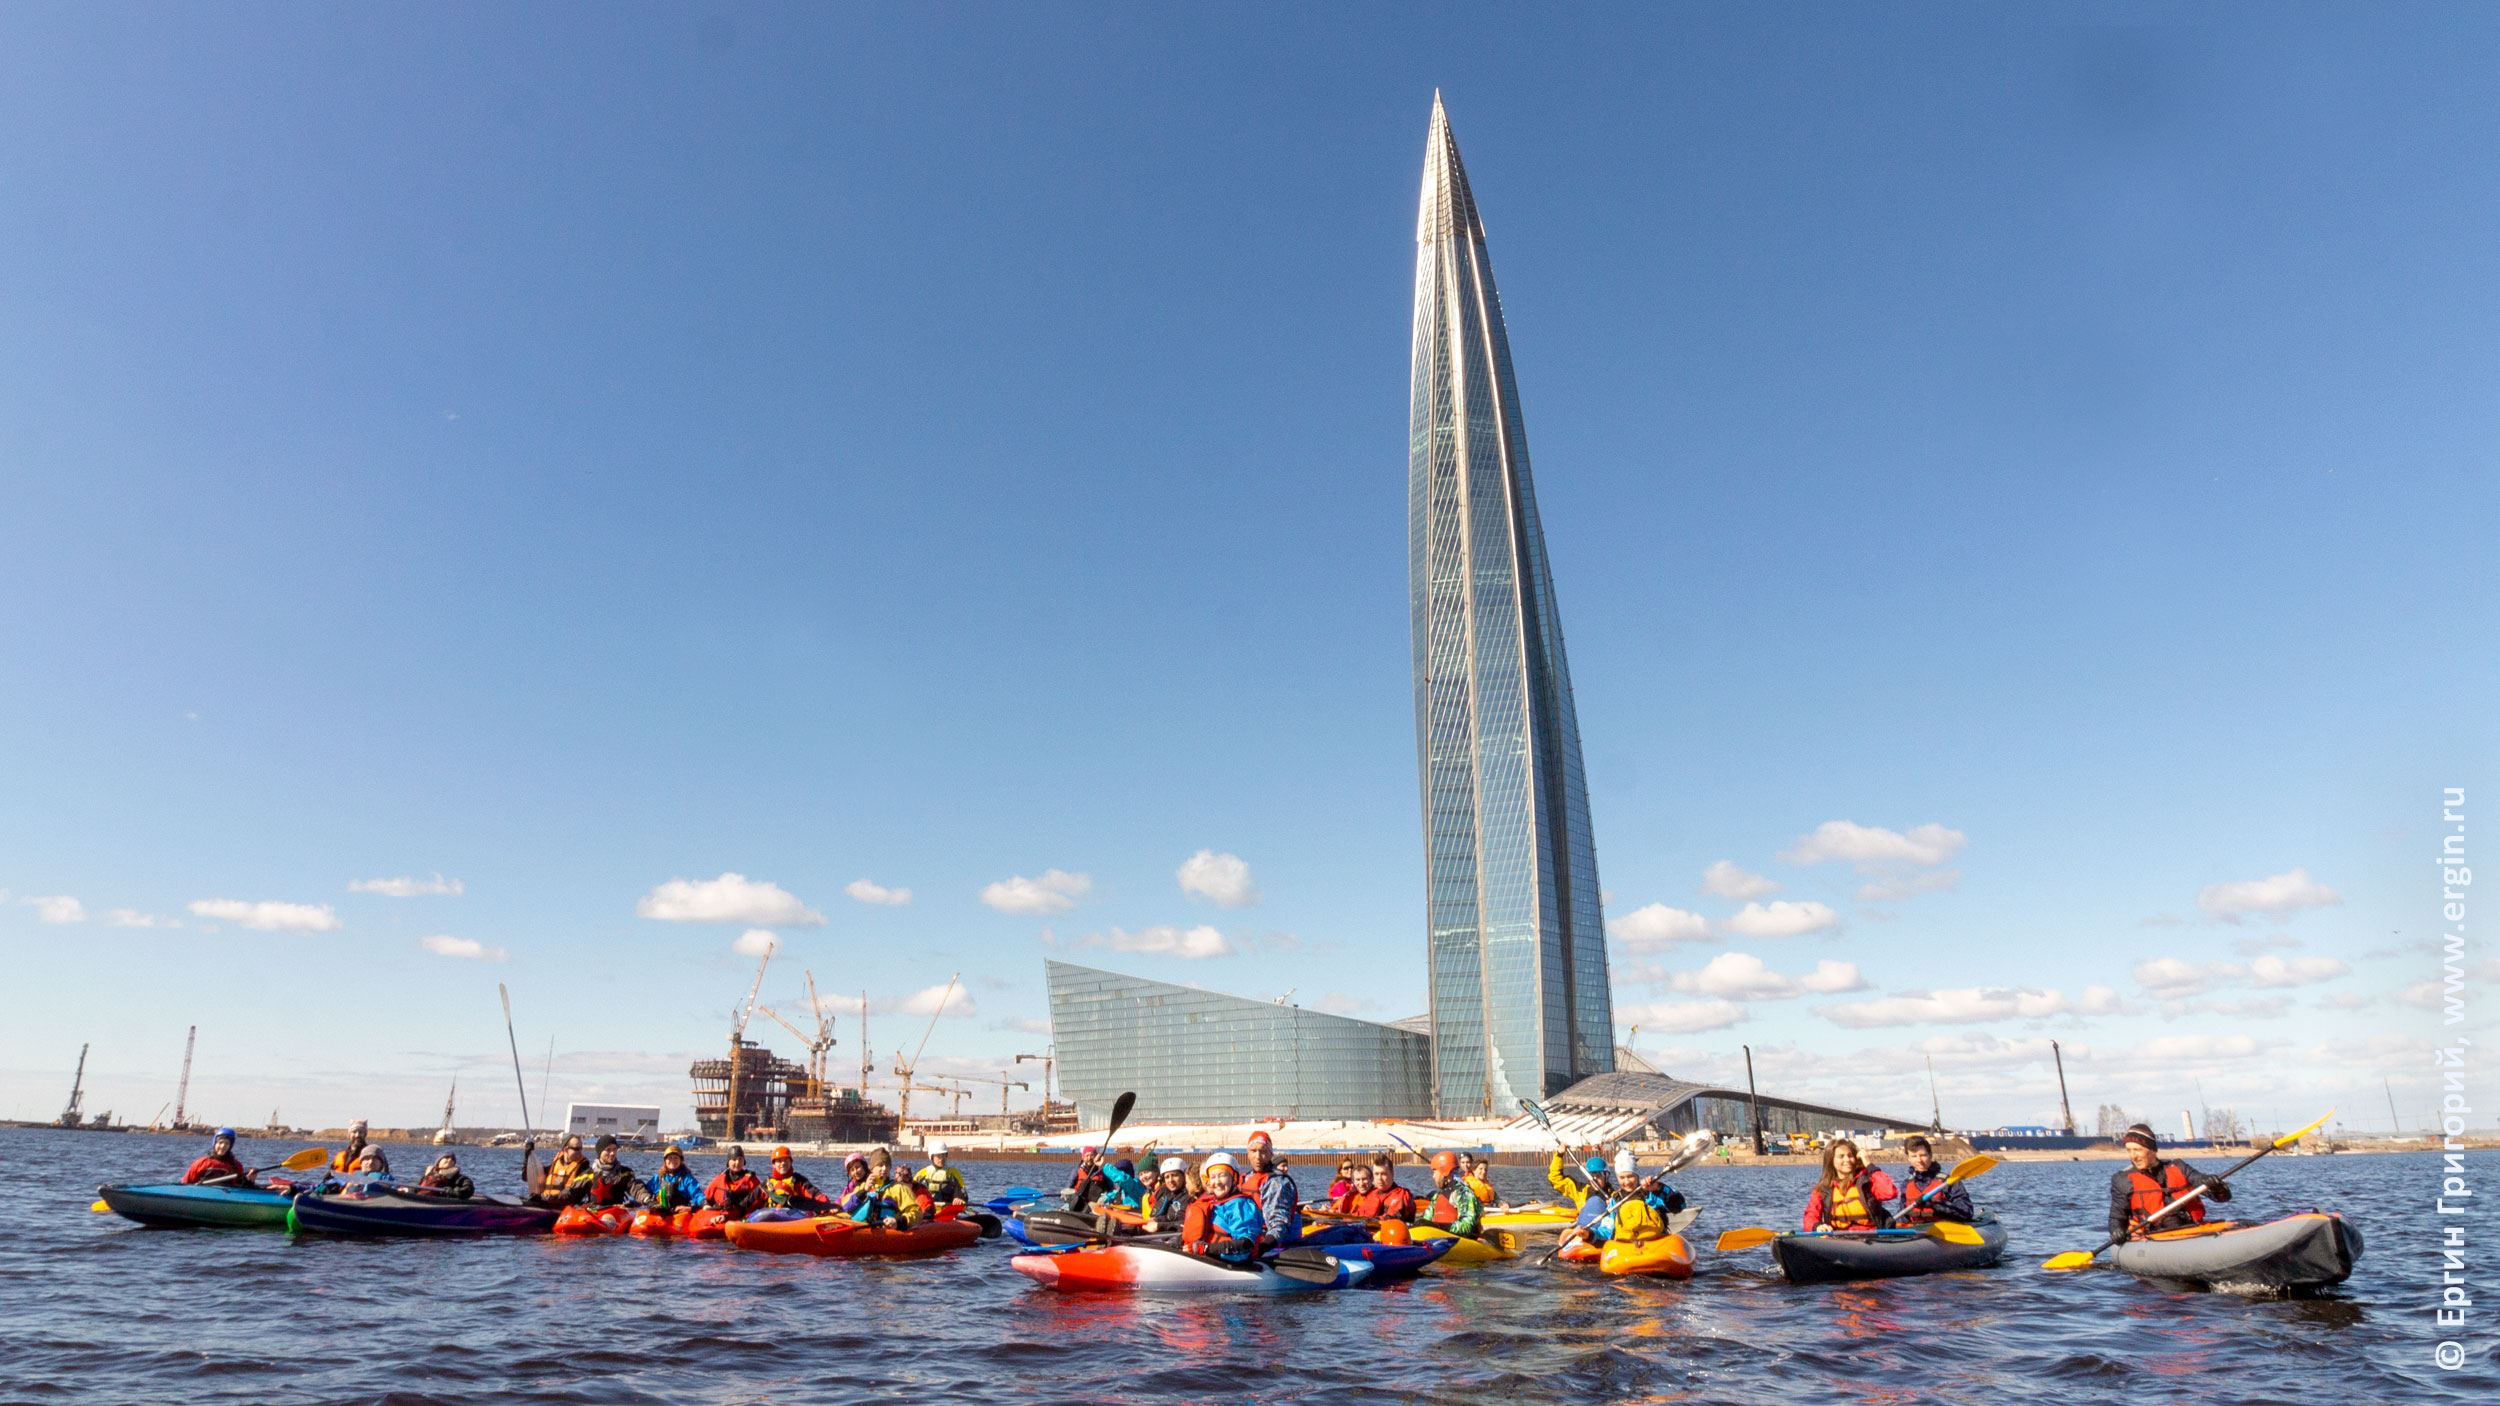 Каякеры и байдарочники у башни Газпрома Лахта-центр